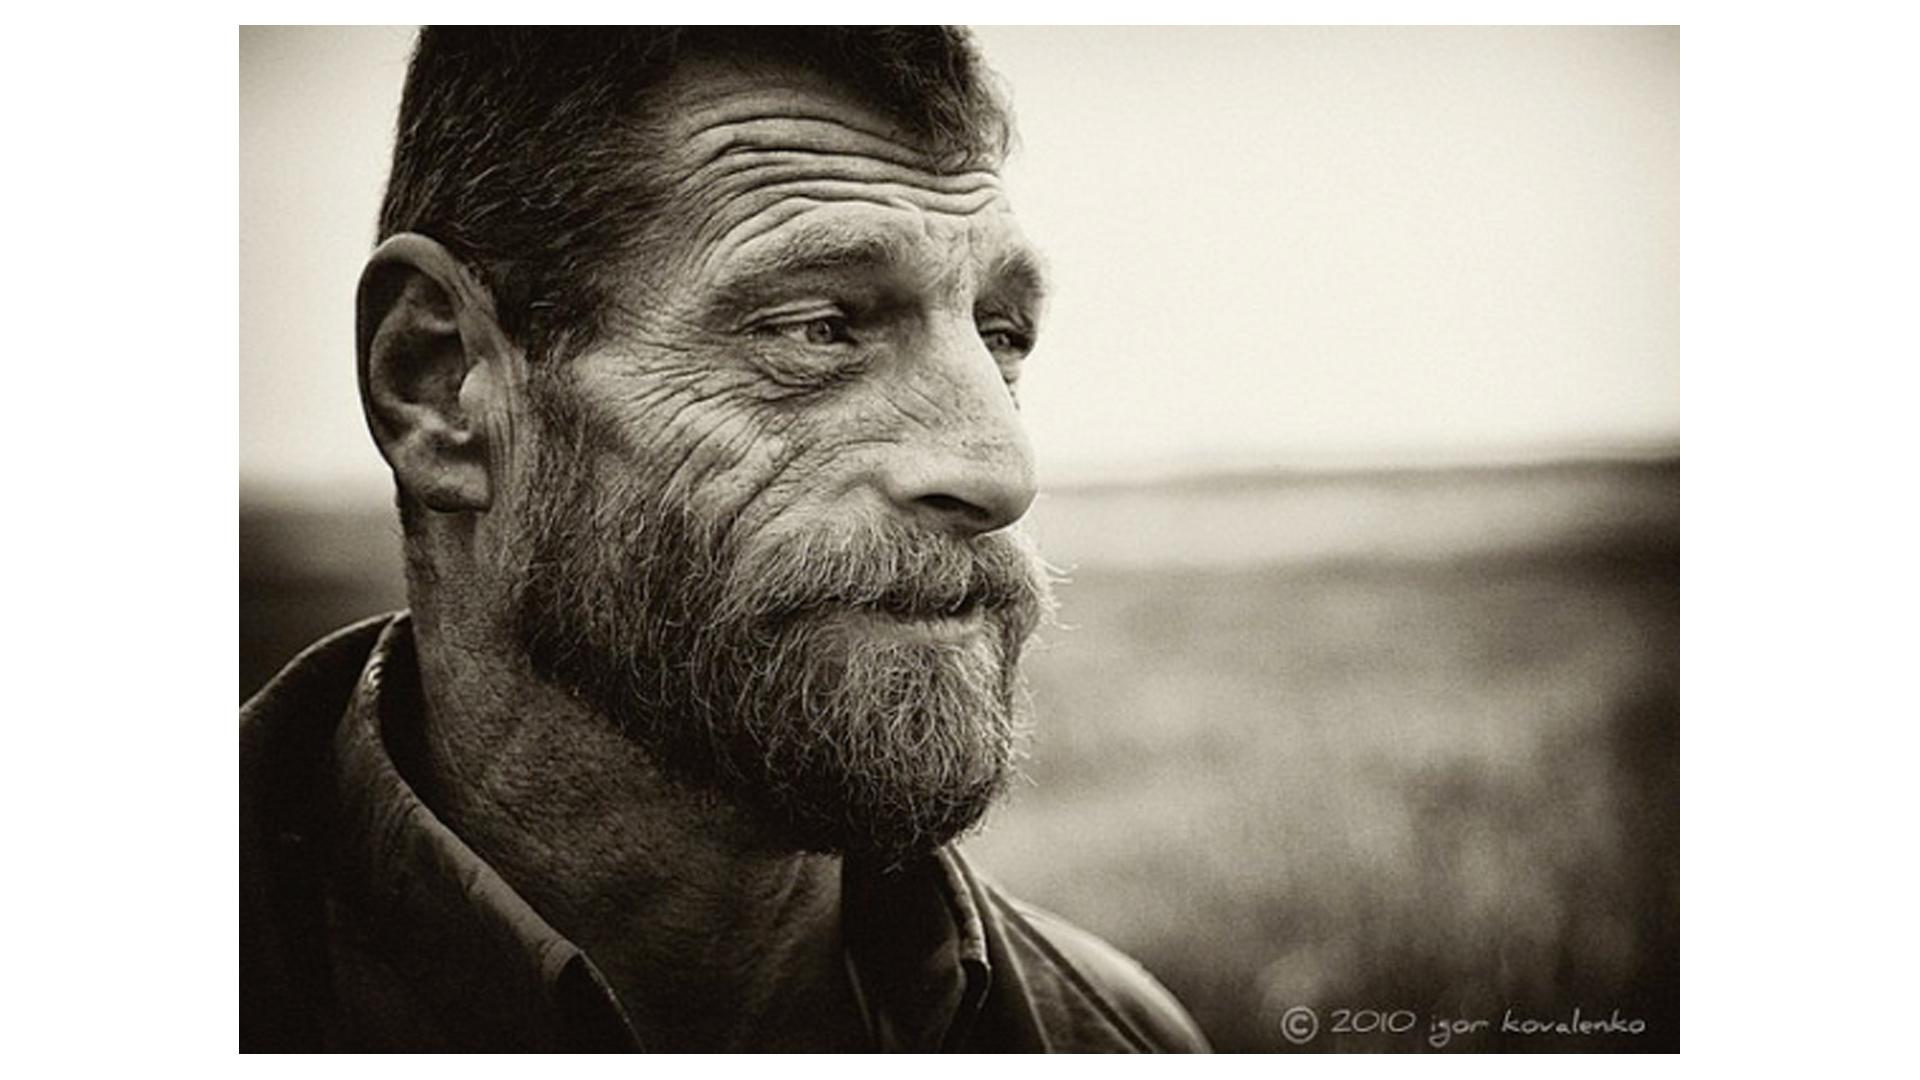 Photographer of the Day - Igor Kovalenko | Photofocus